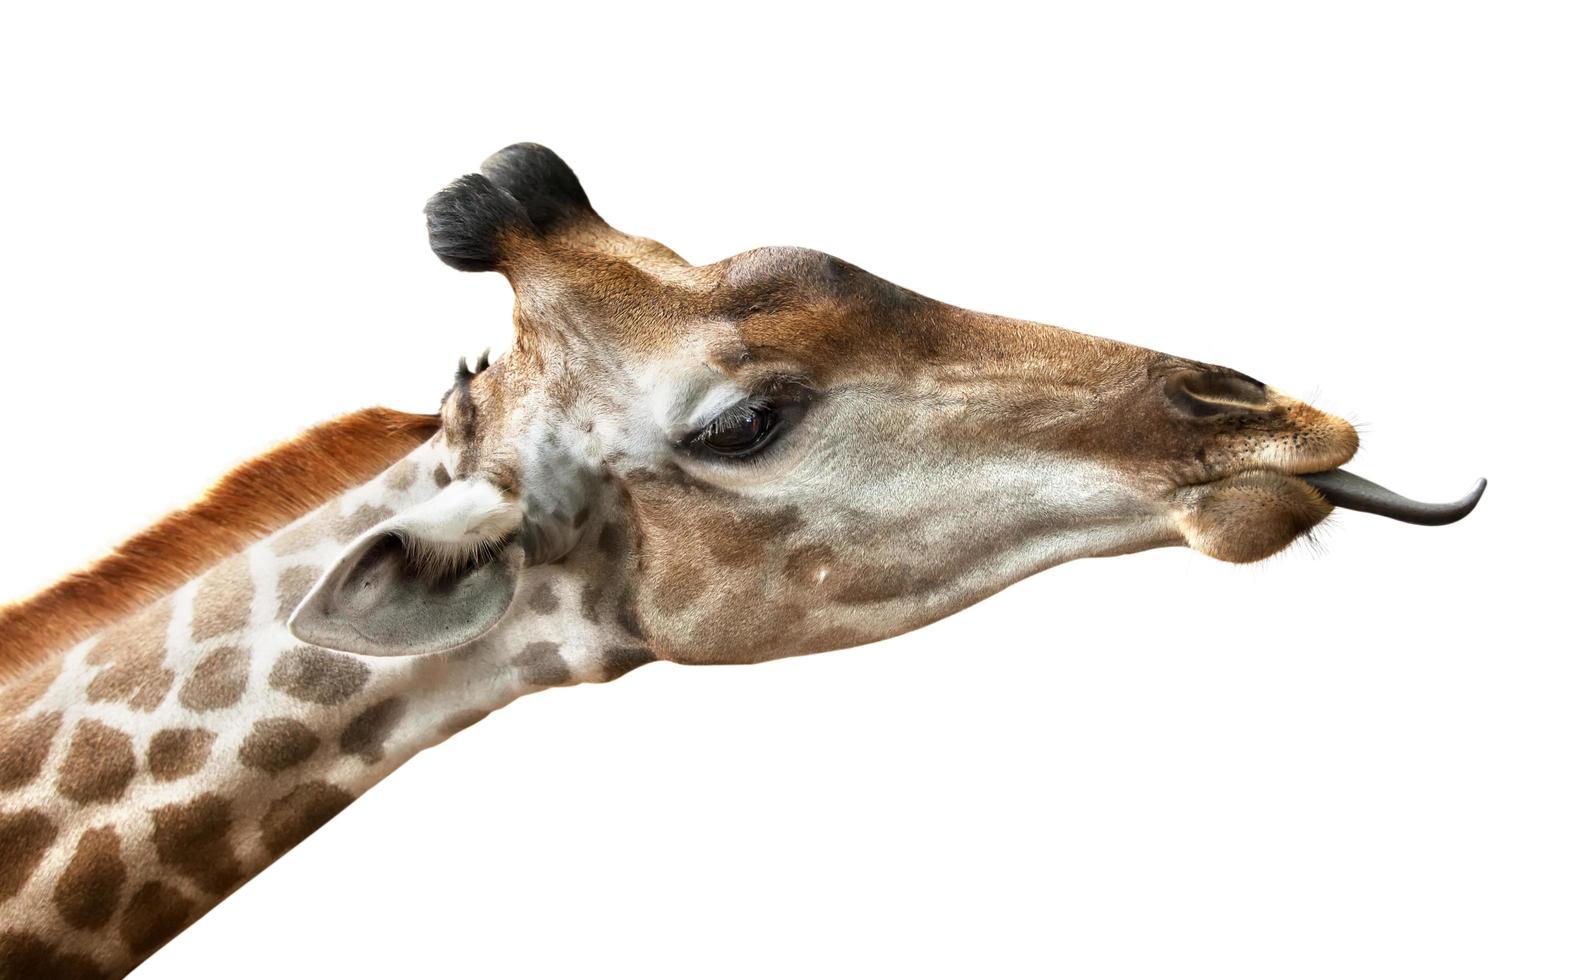 jirafa sobre fondo blanco foto